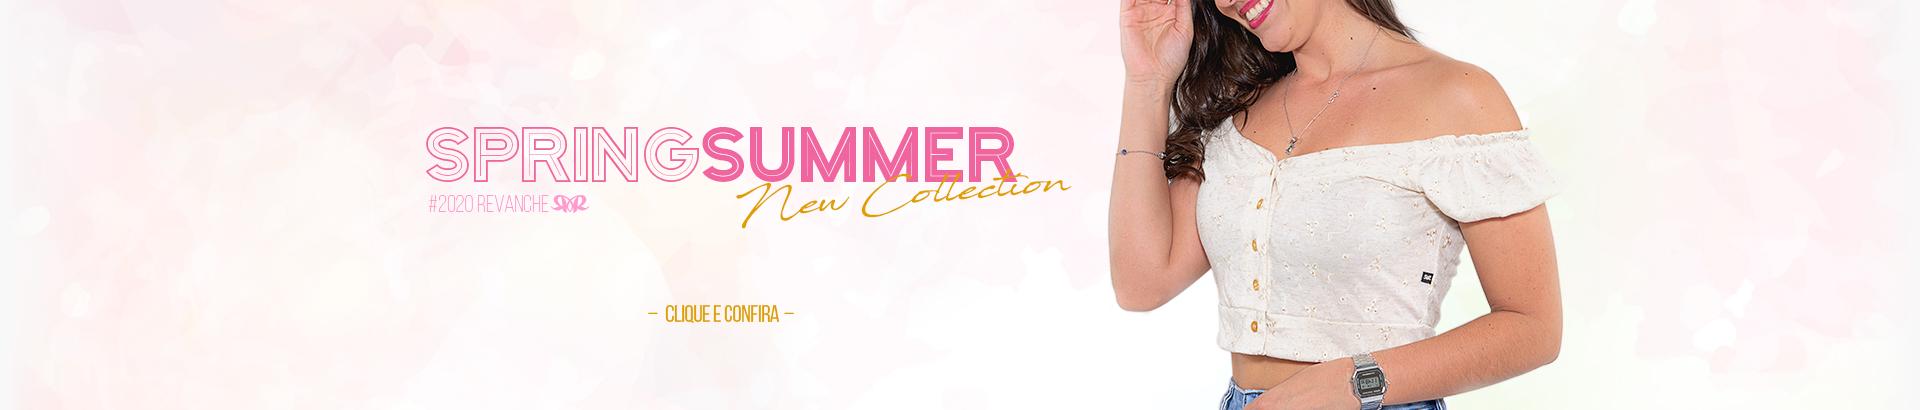 Banner - Spring Summer Fem